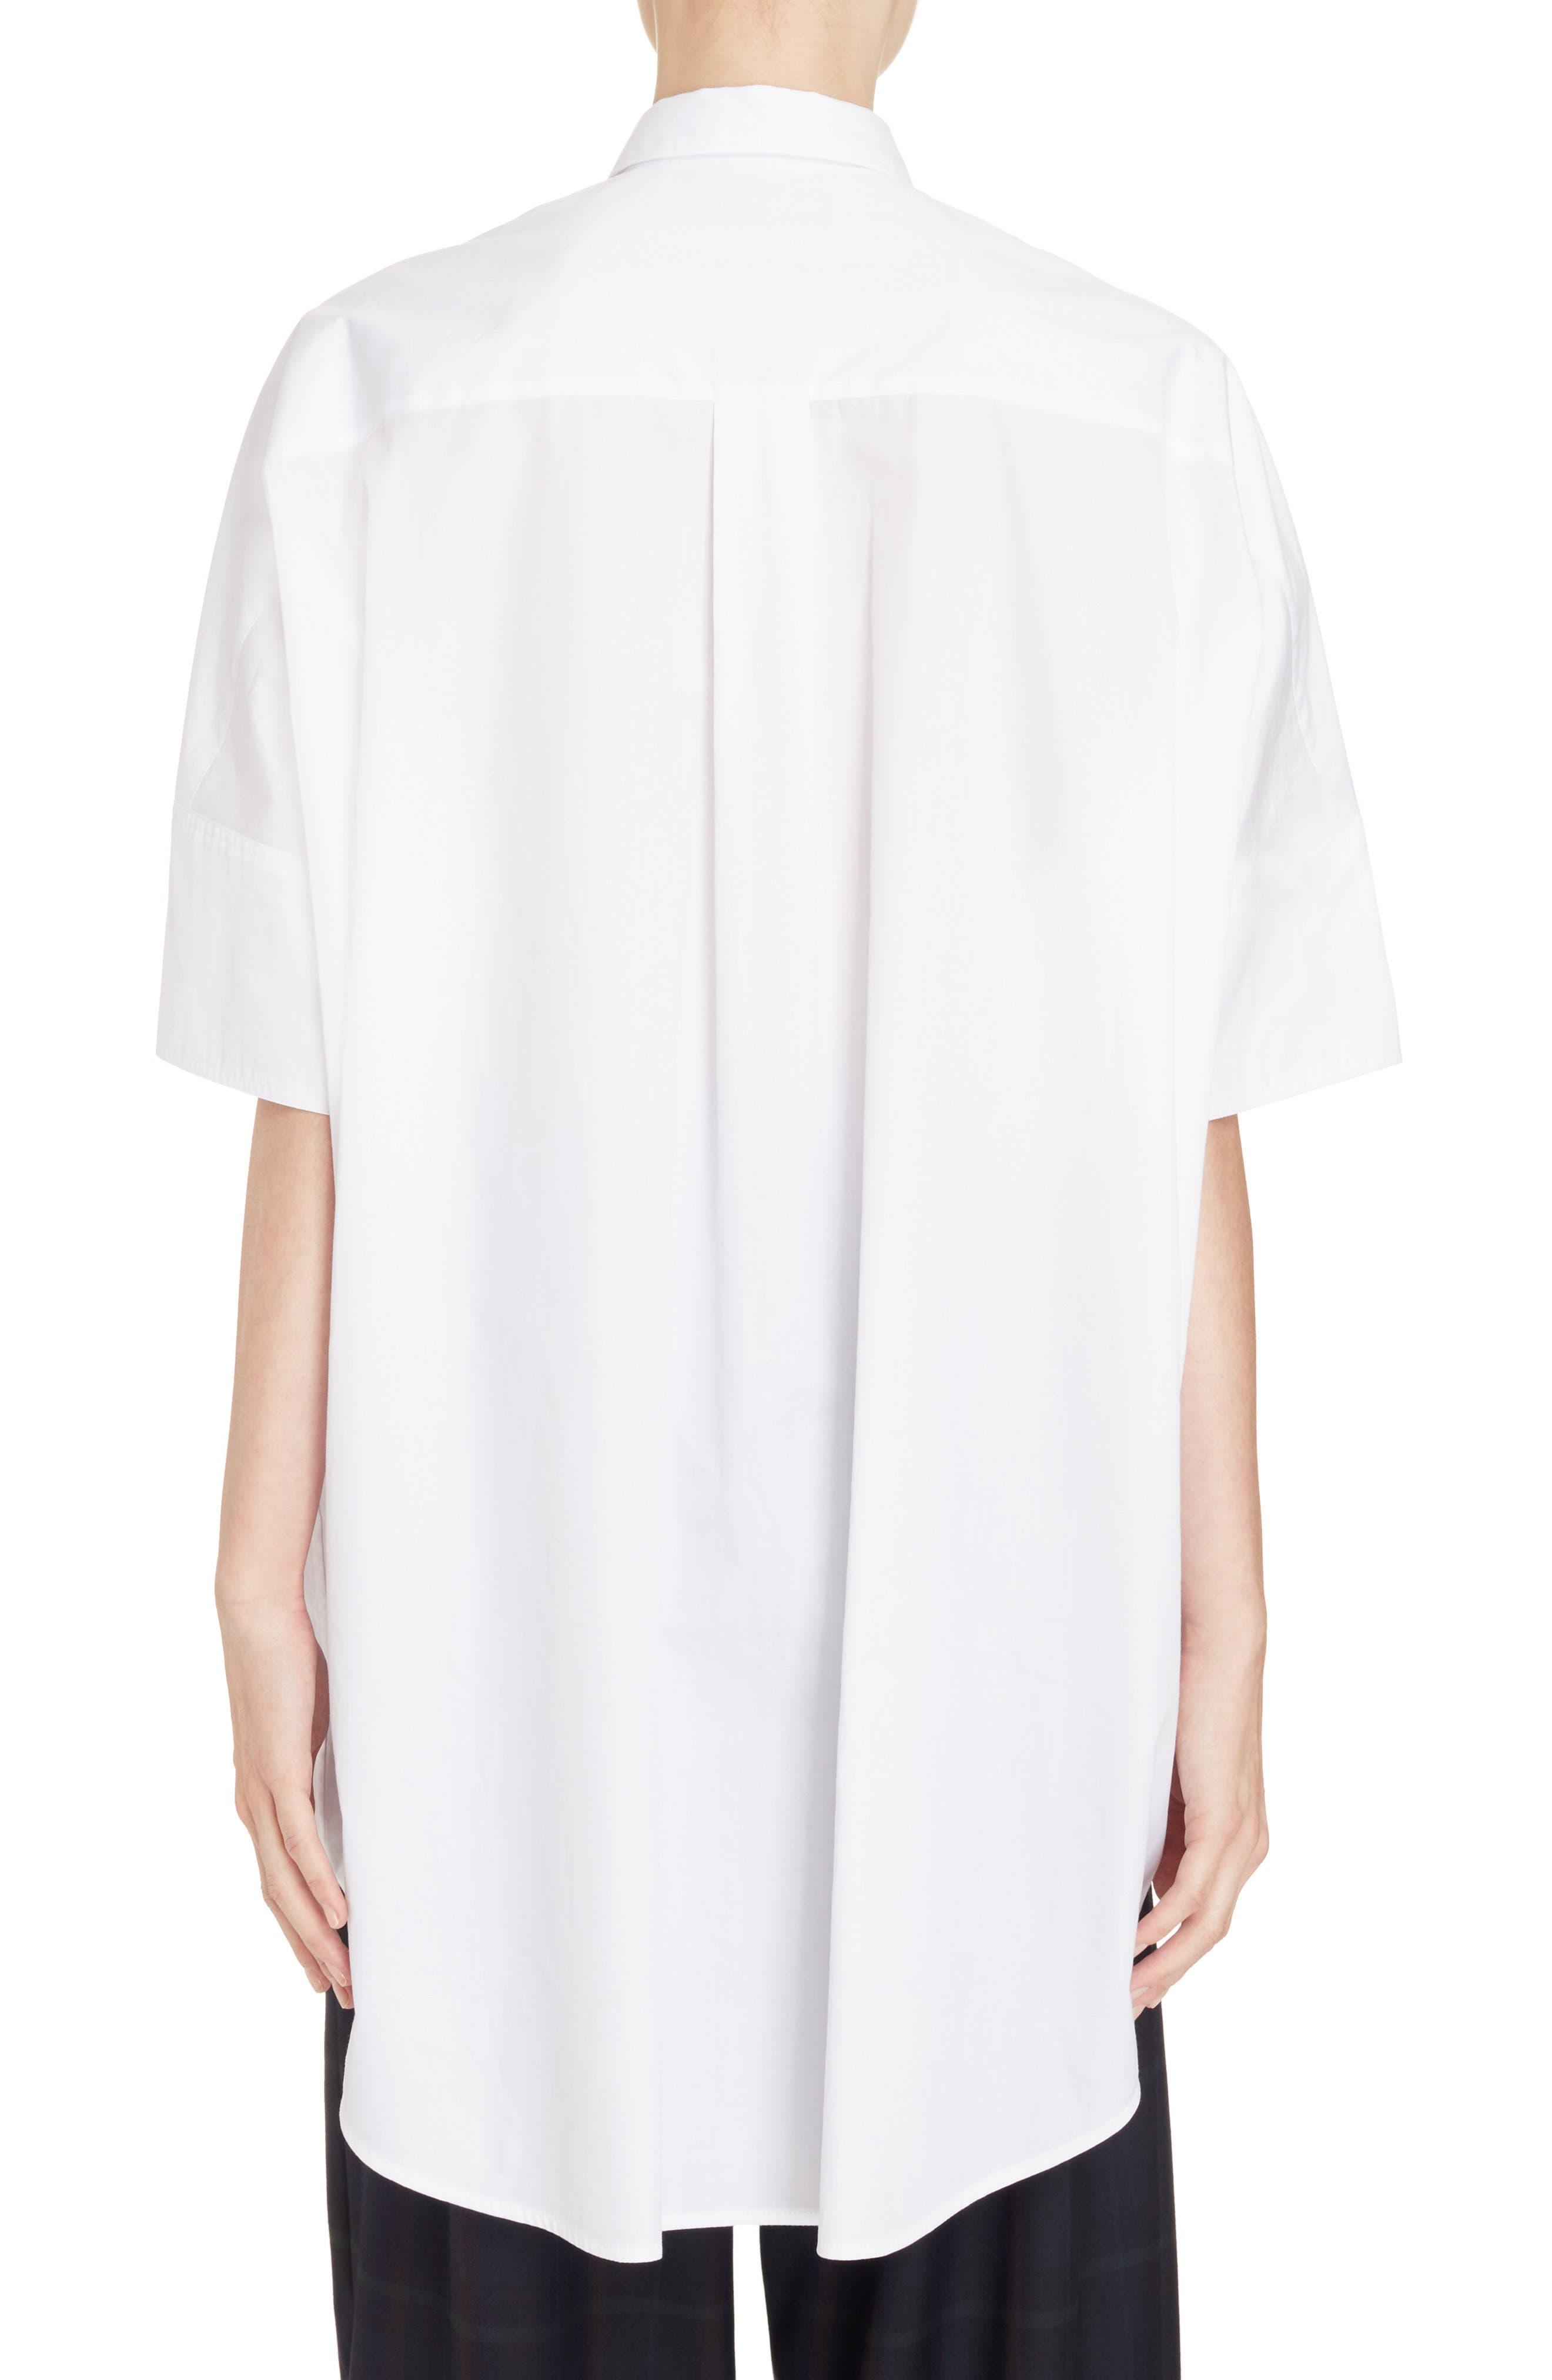 Alternate Image 2  - Y's by Yohji Yamamoto Oversize Drop Hem Shirt